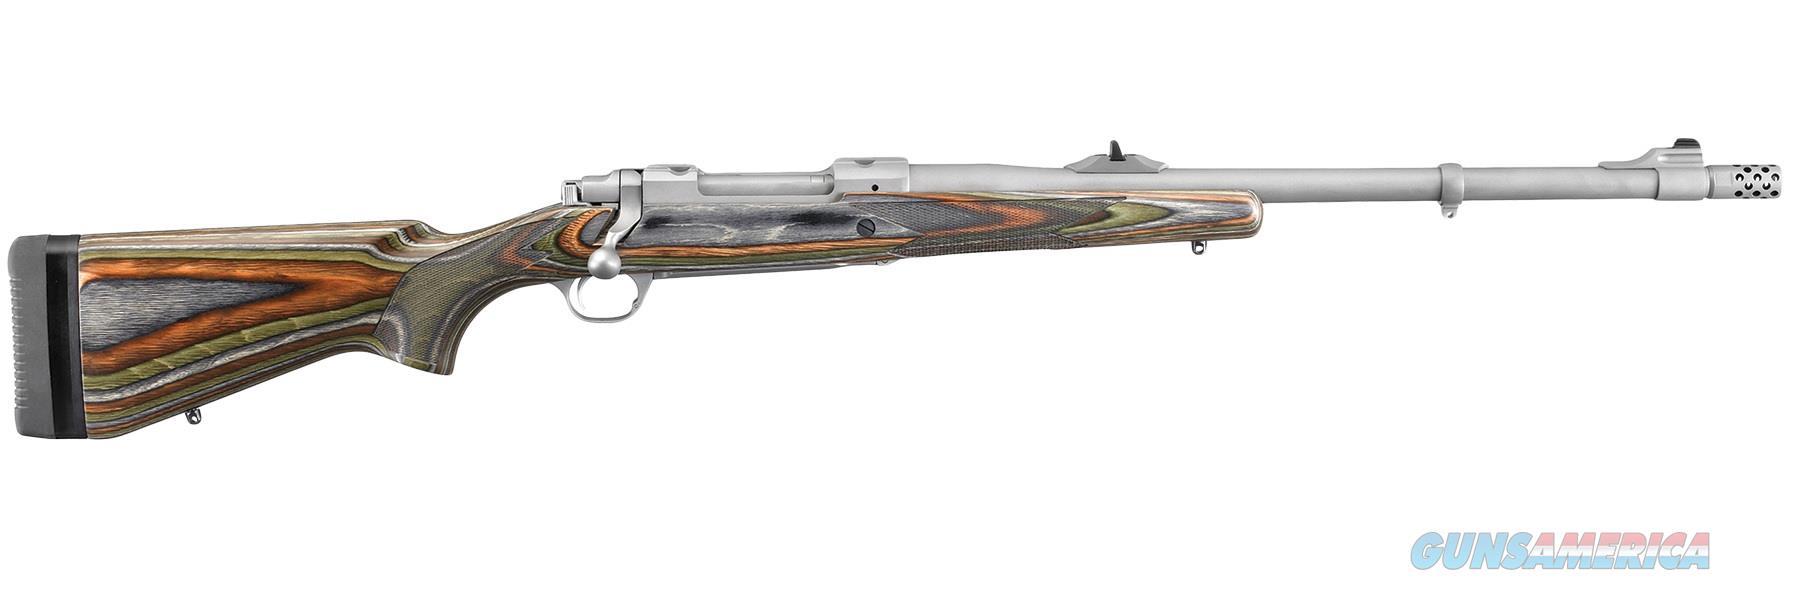 "Ruger M77 Hawkeye Guide Gun .300 RCM 20"" SS 47114   Guns > Rifles > Ruger Rifles > Model 77"